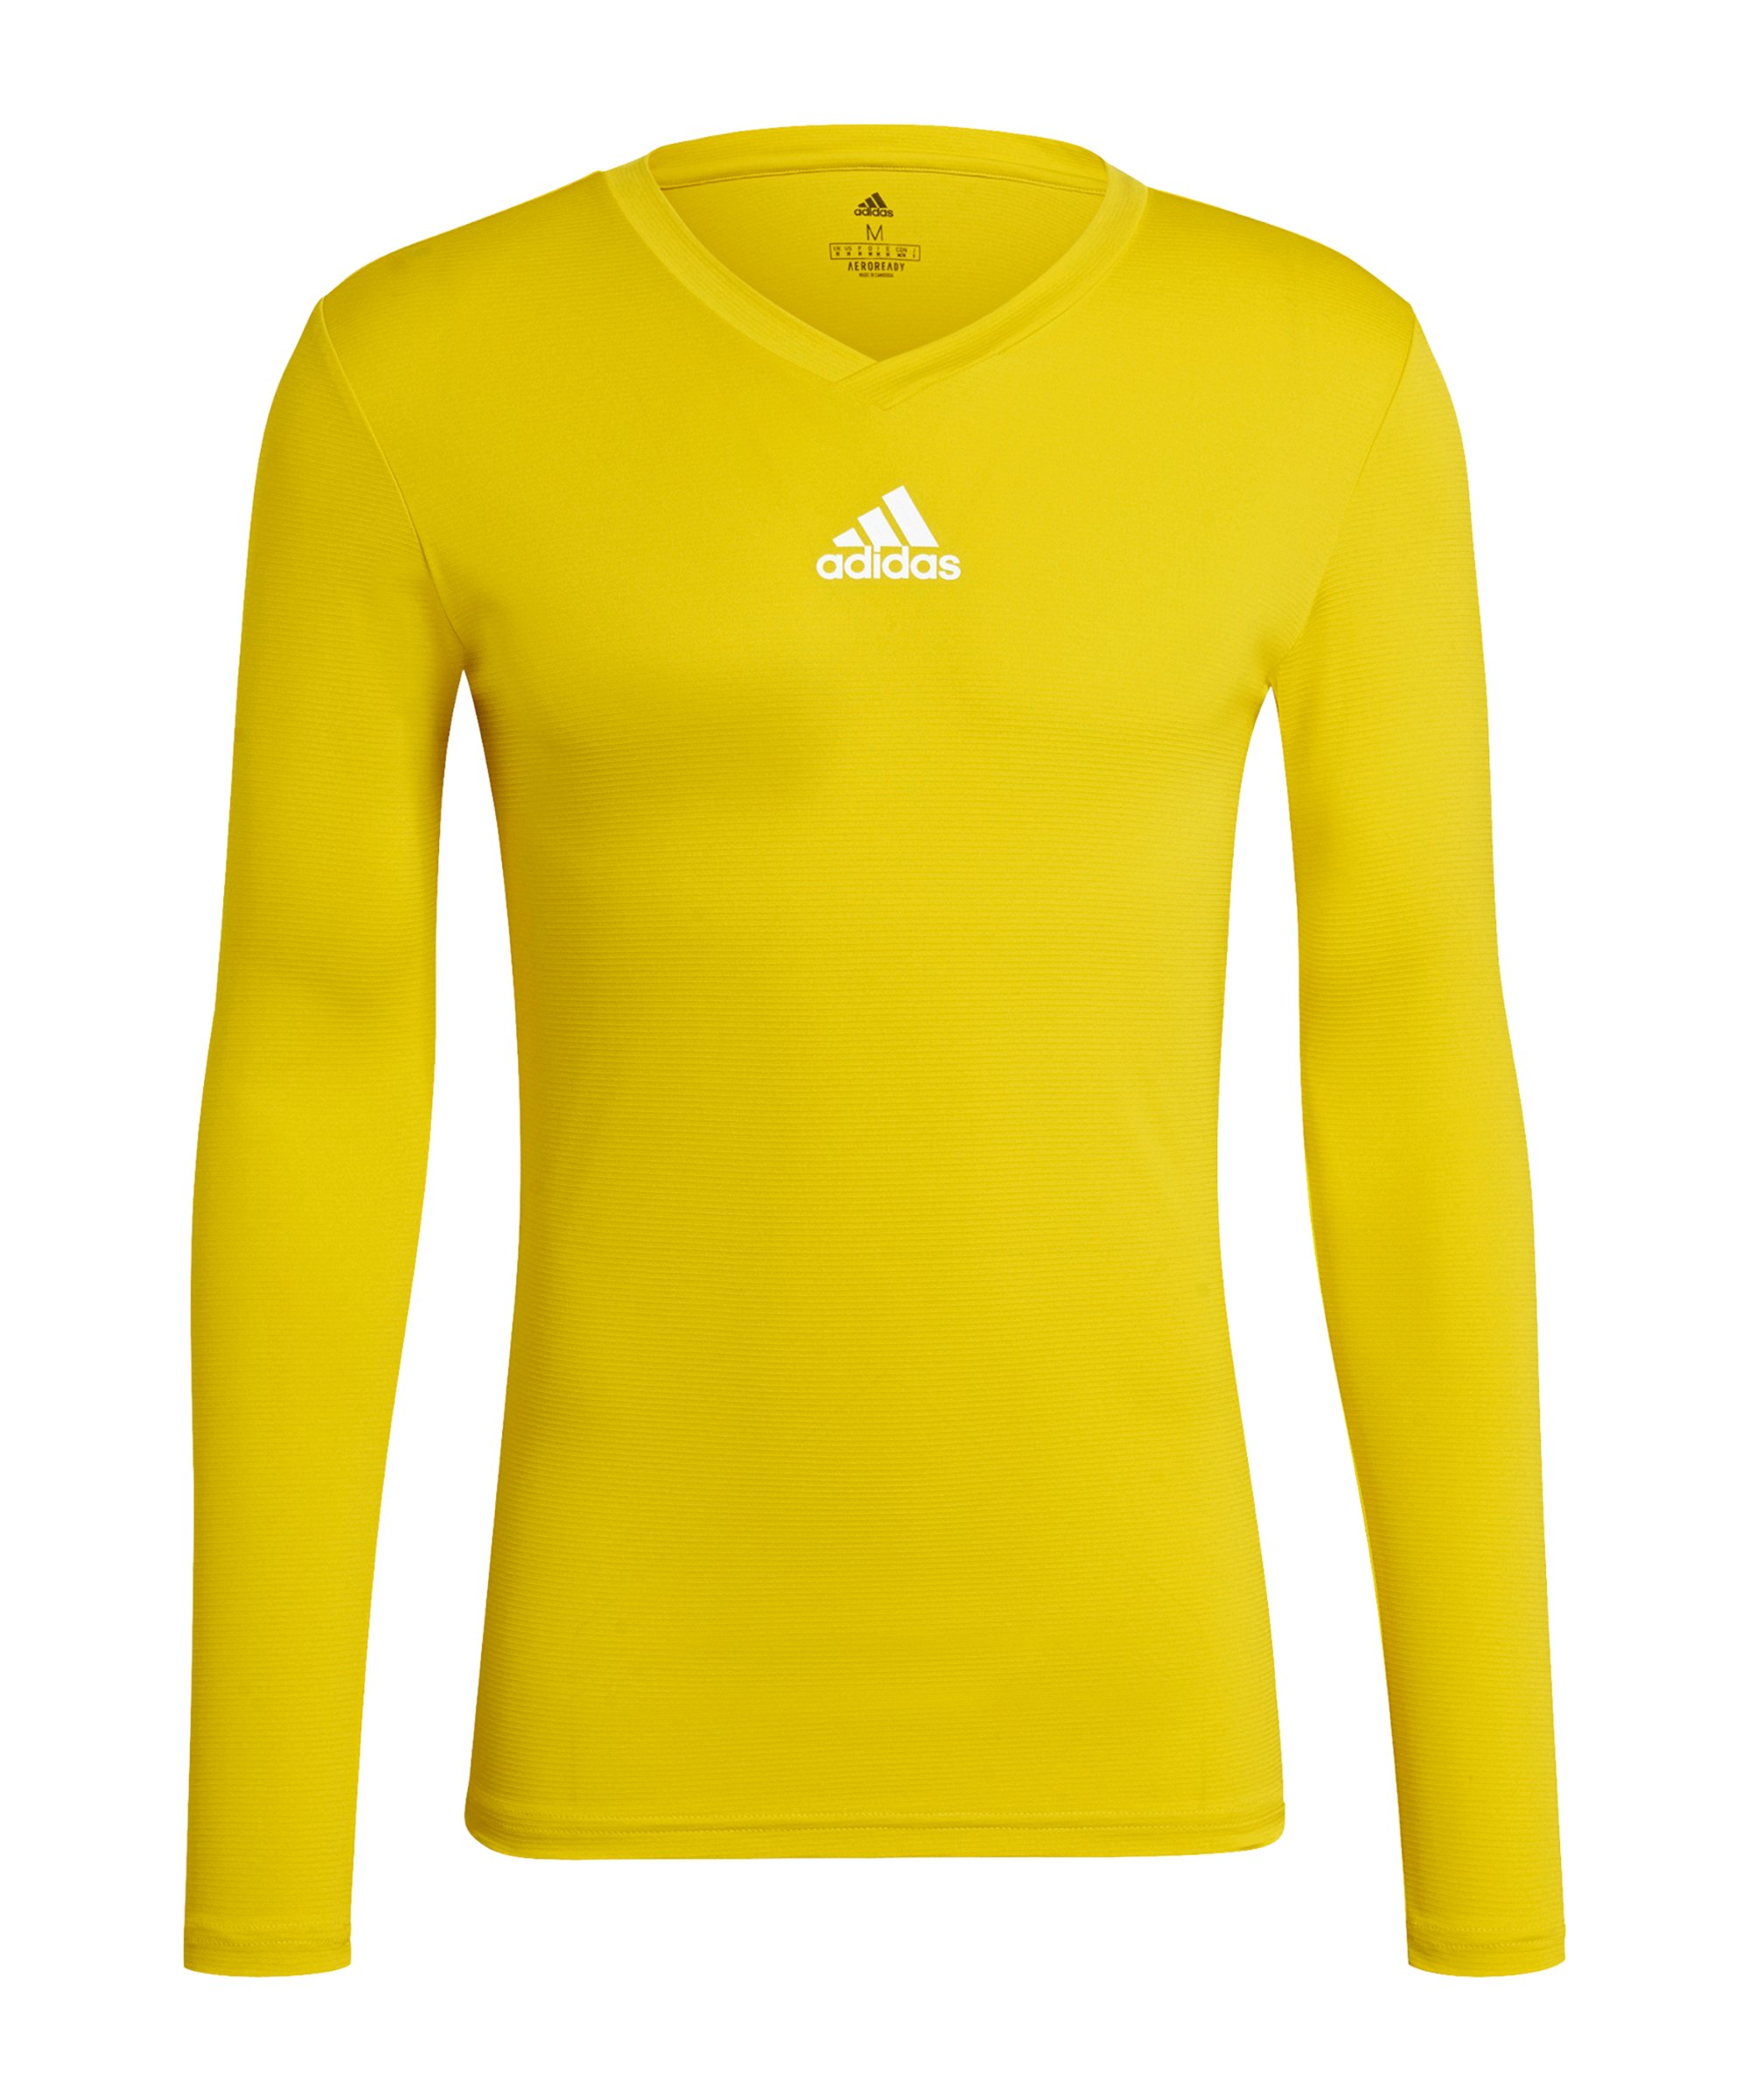 adidas Team Base Top langarm Gelb - gelb